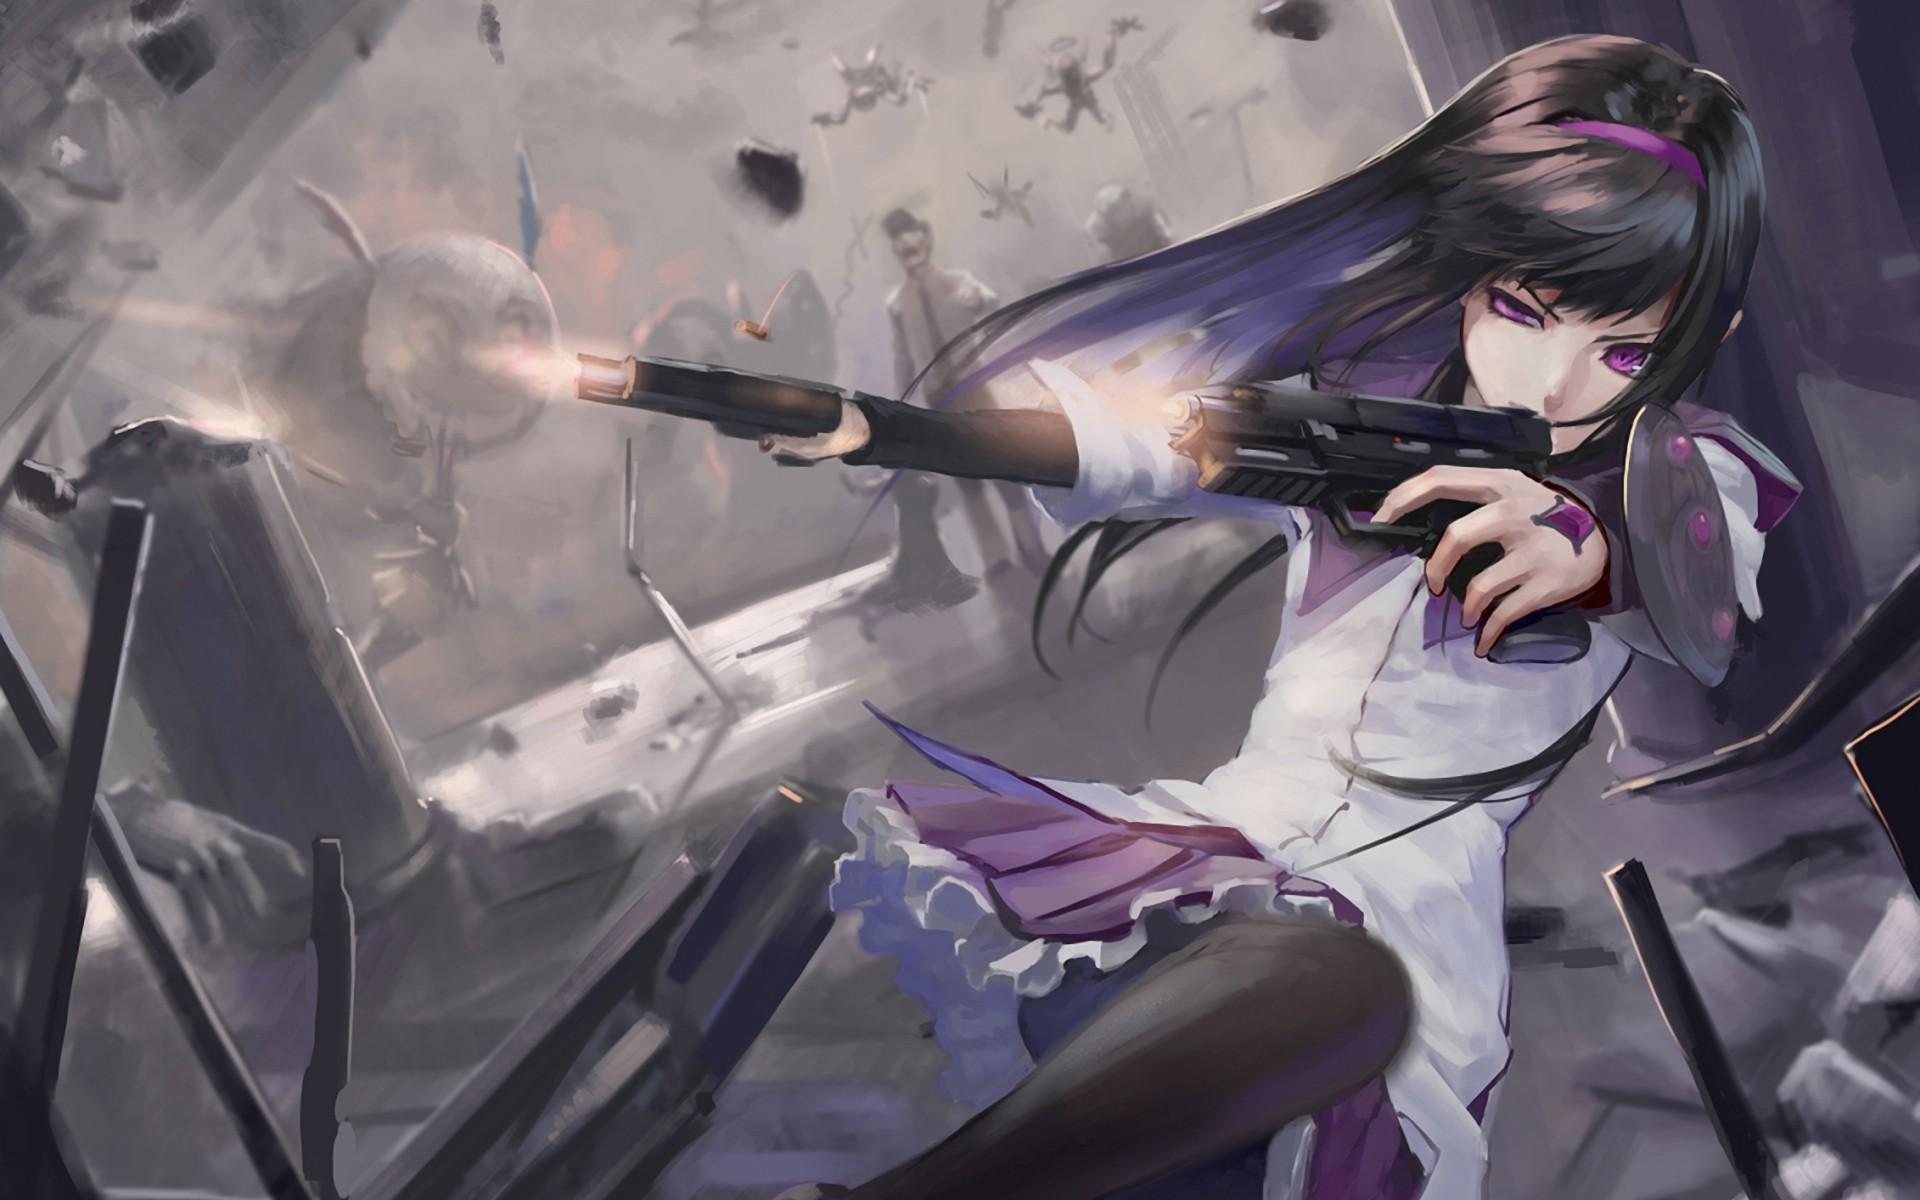 Картинки девушек аниме с пистолетом